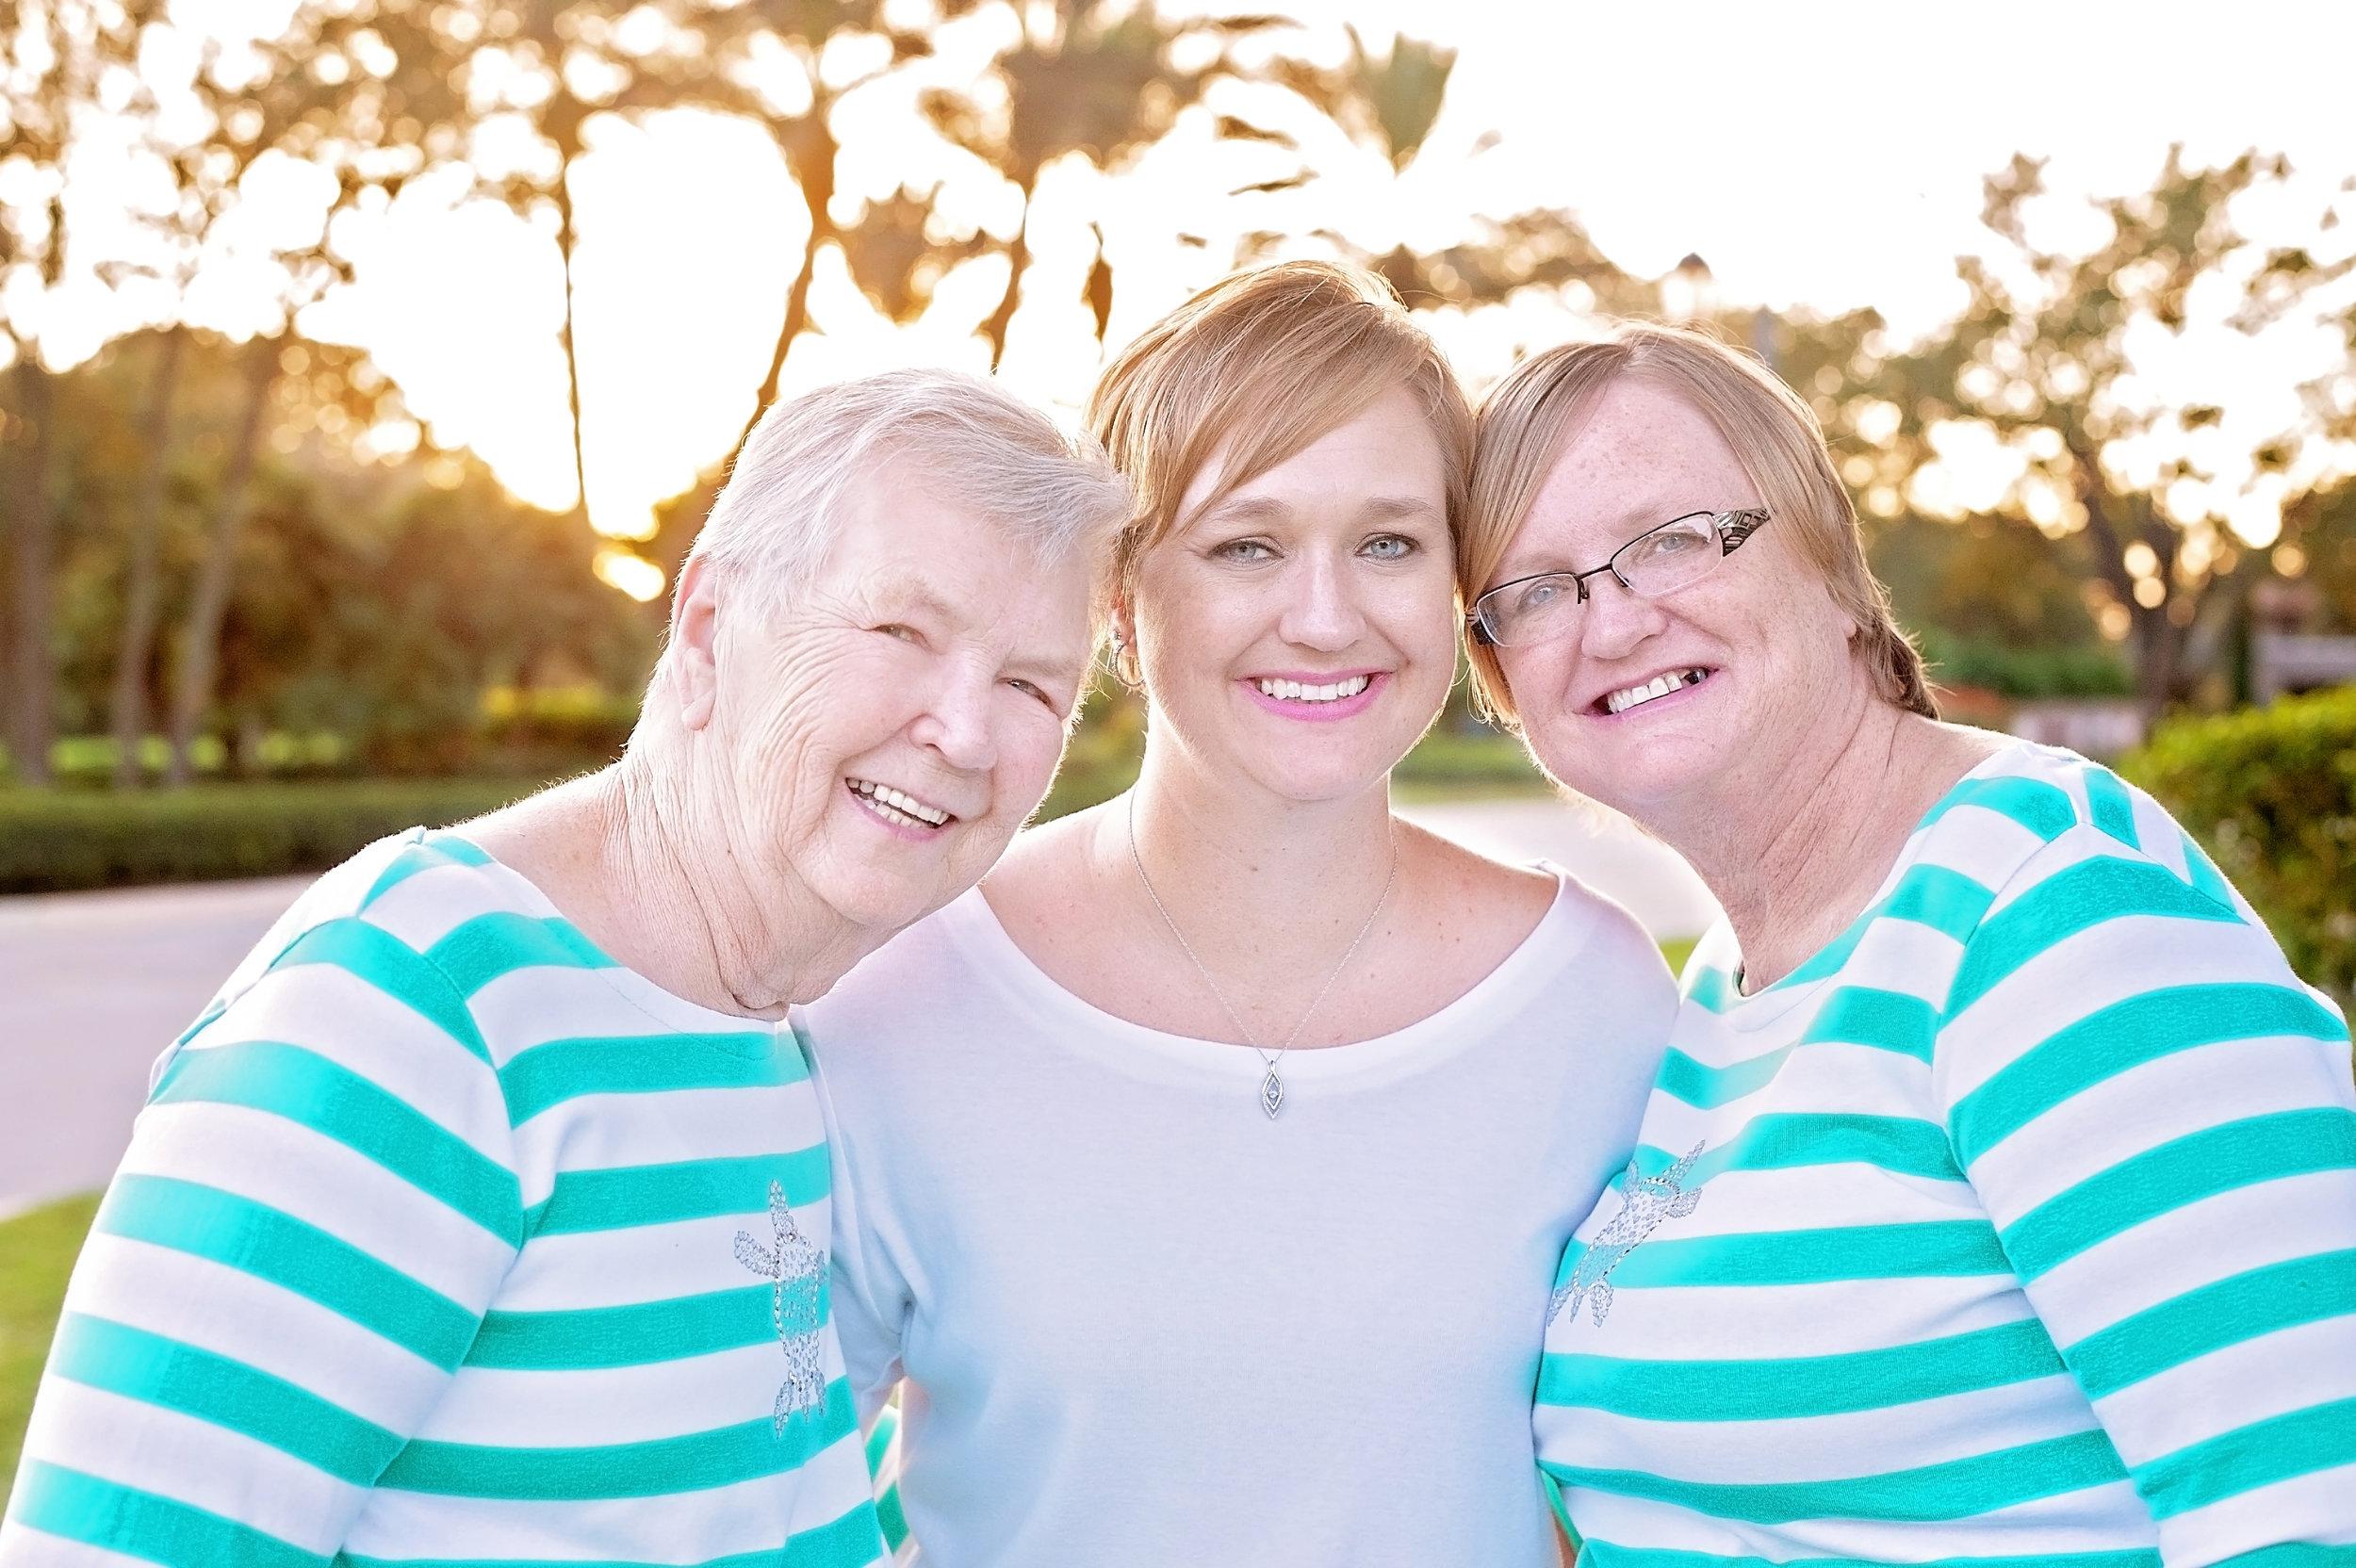 Holly family 2.jpg